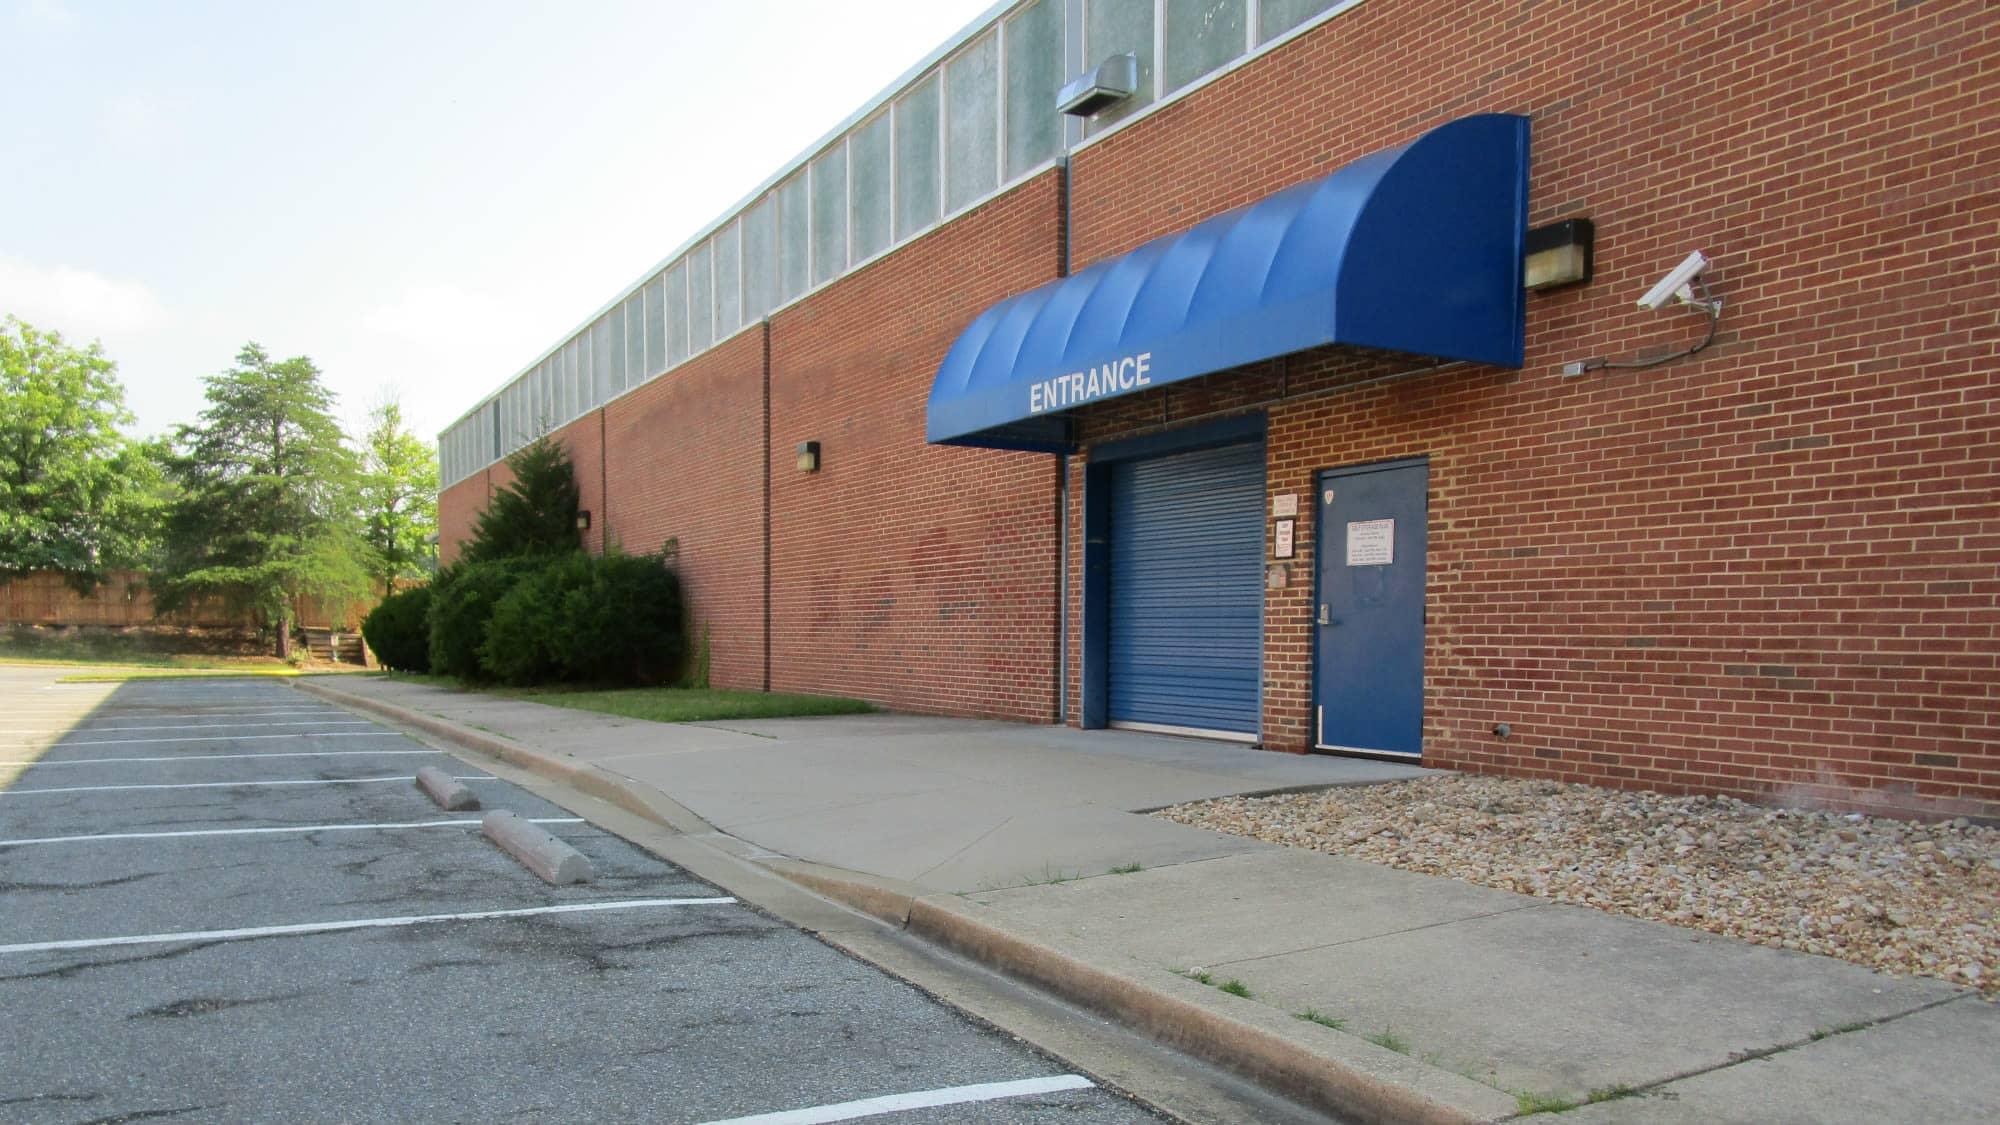 Parking spaces at Self Storage Plus in Lanham, MD